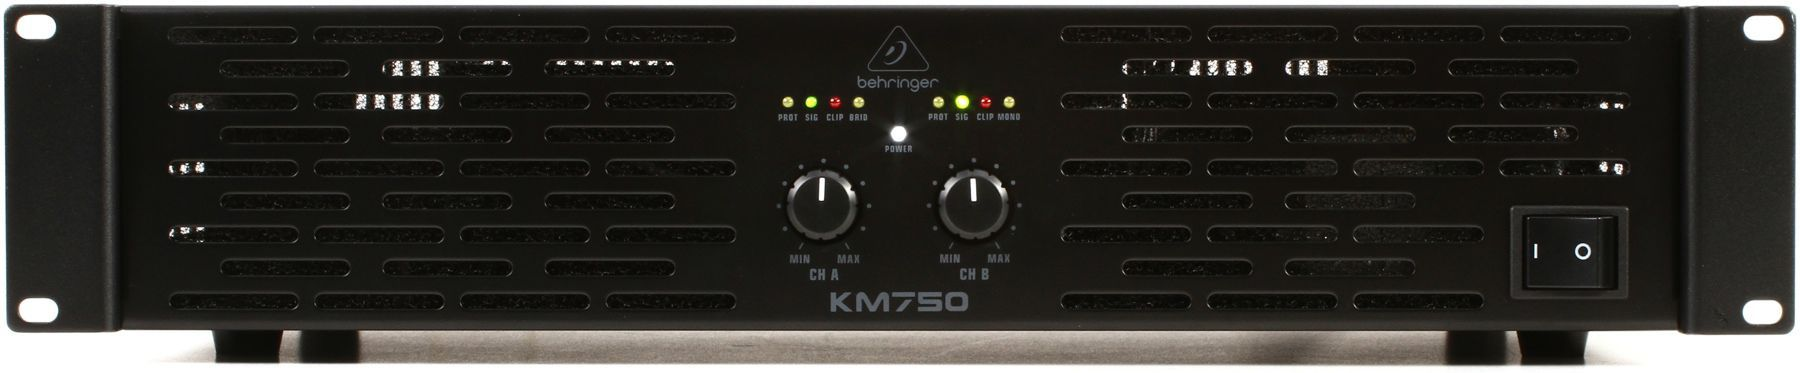 Amplificador de Potência Behringer Km750 750W